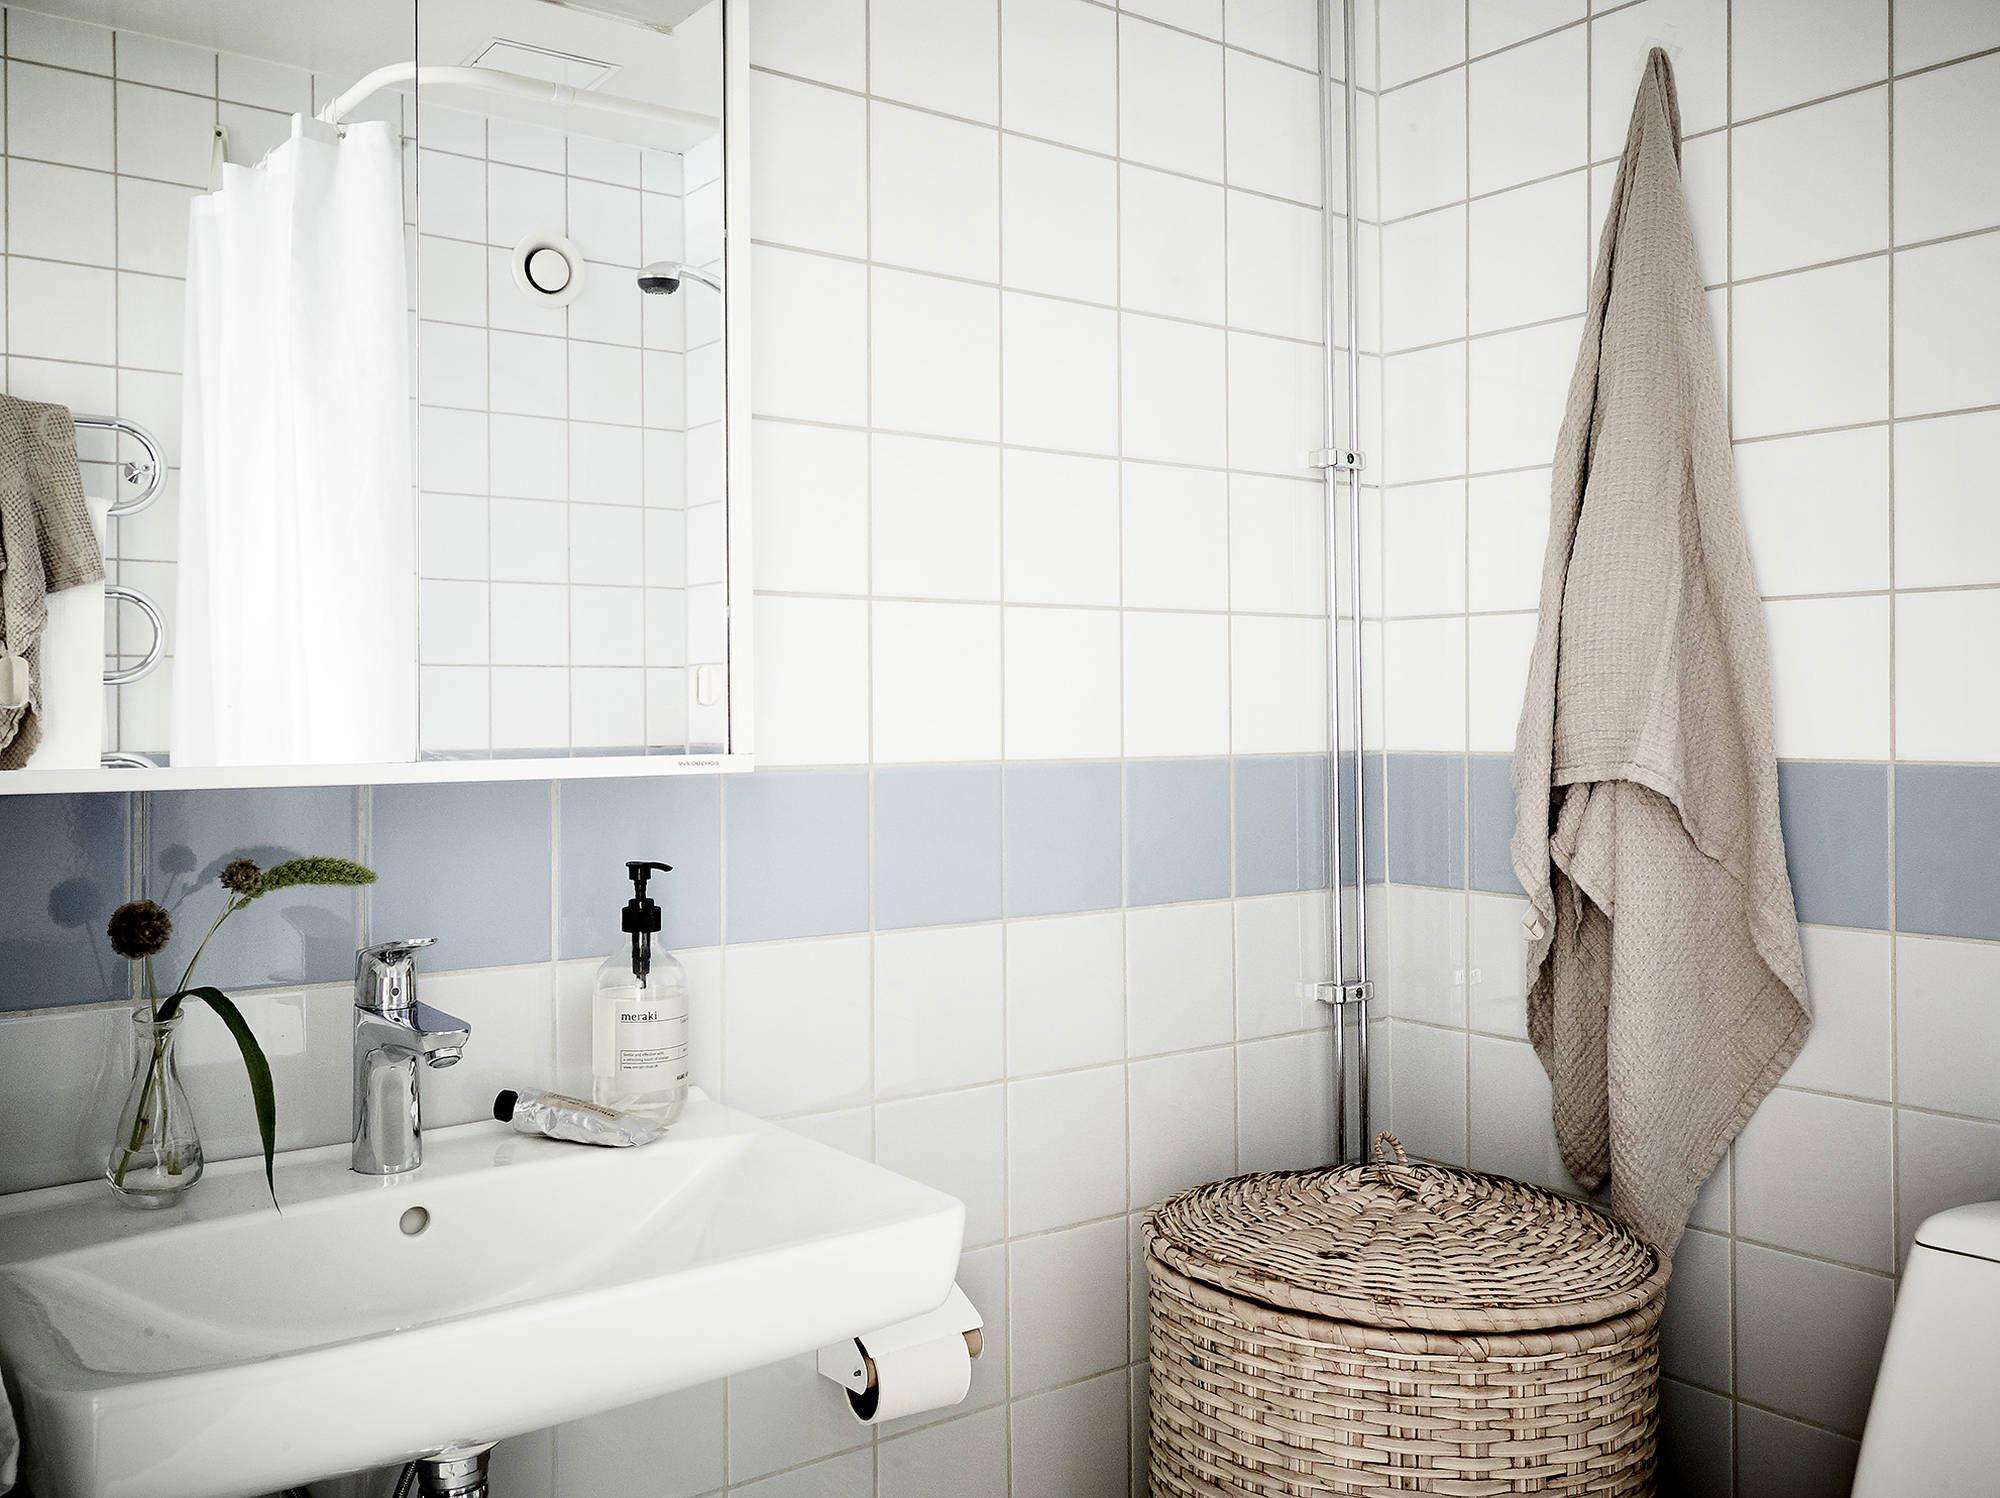 Serene Swedish Home in Warm Grey Hues - NordicDesign